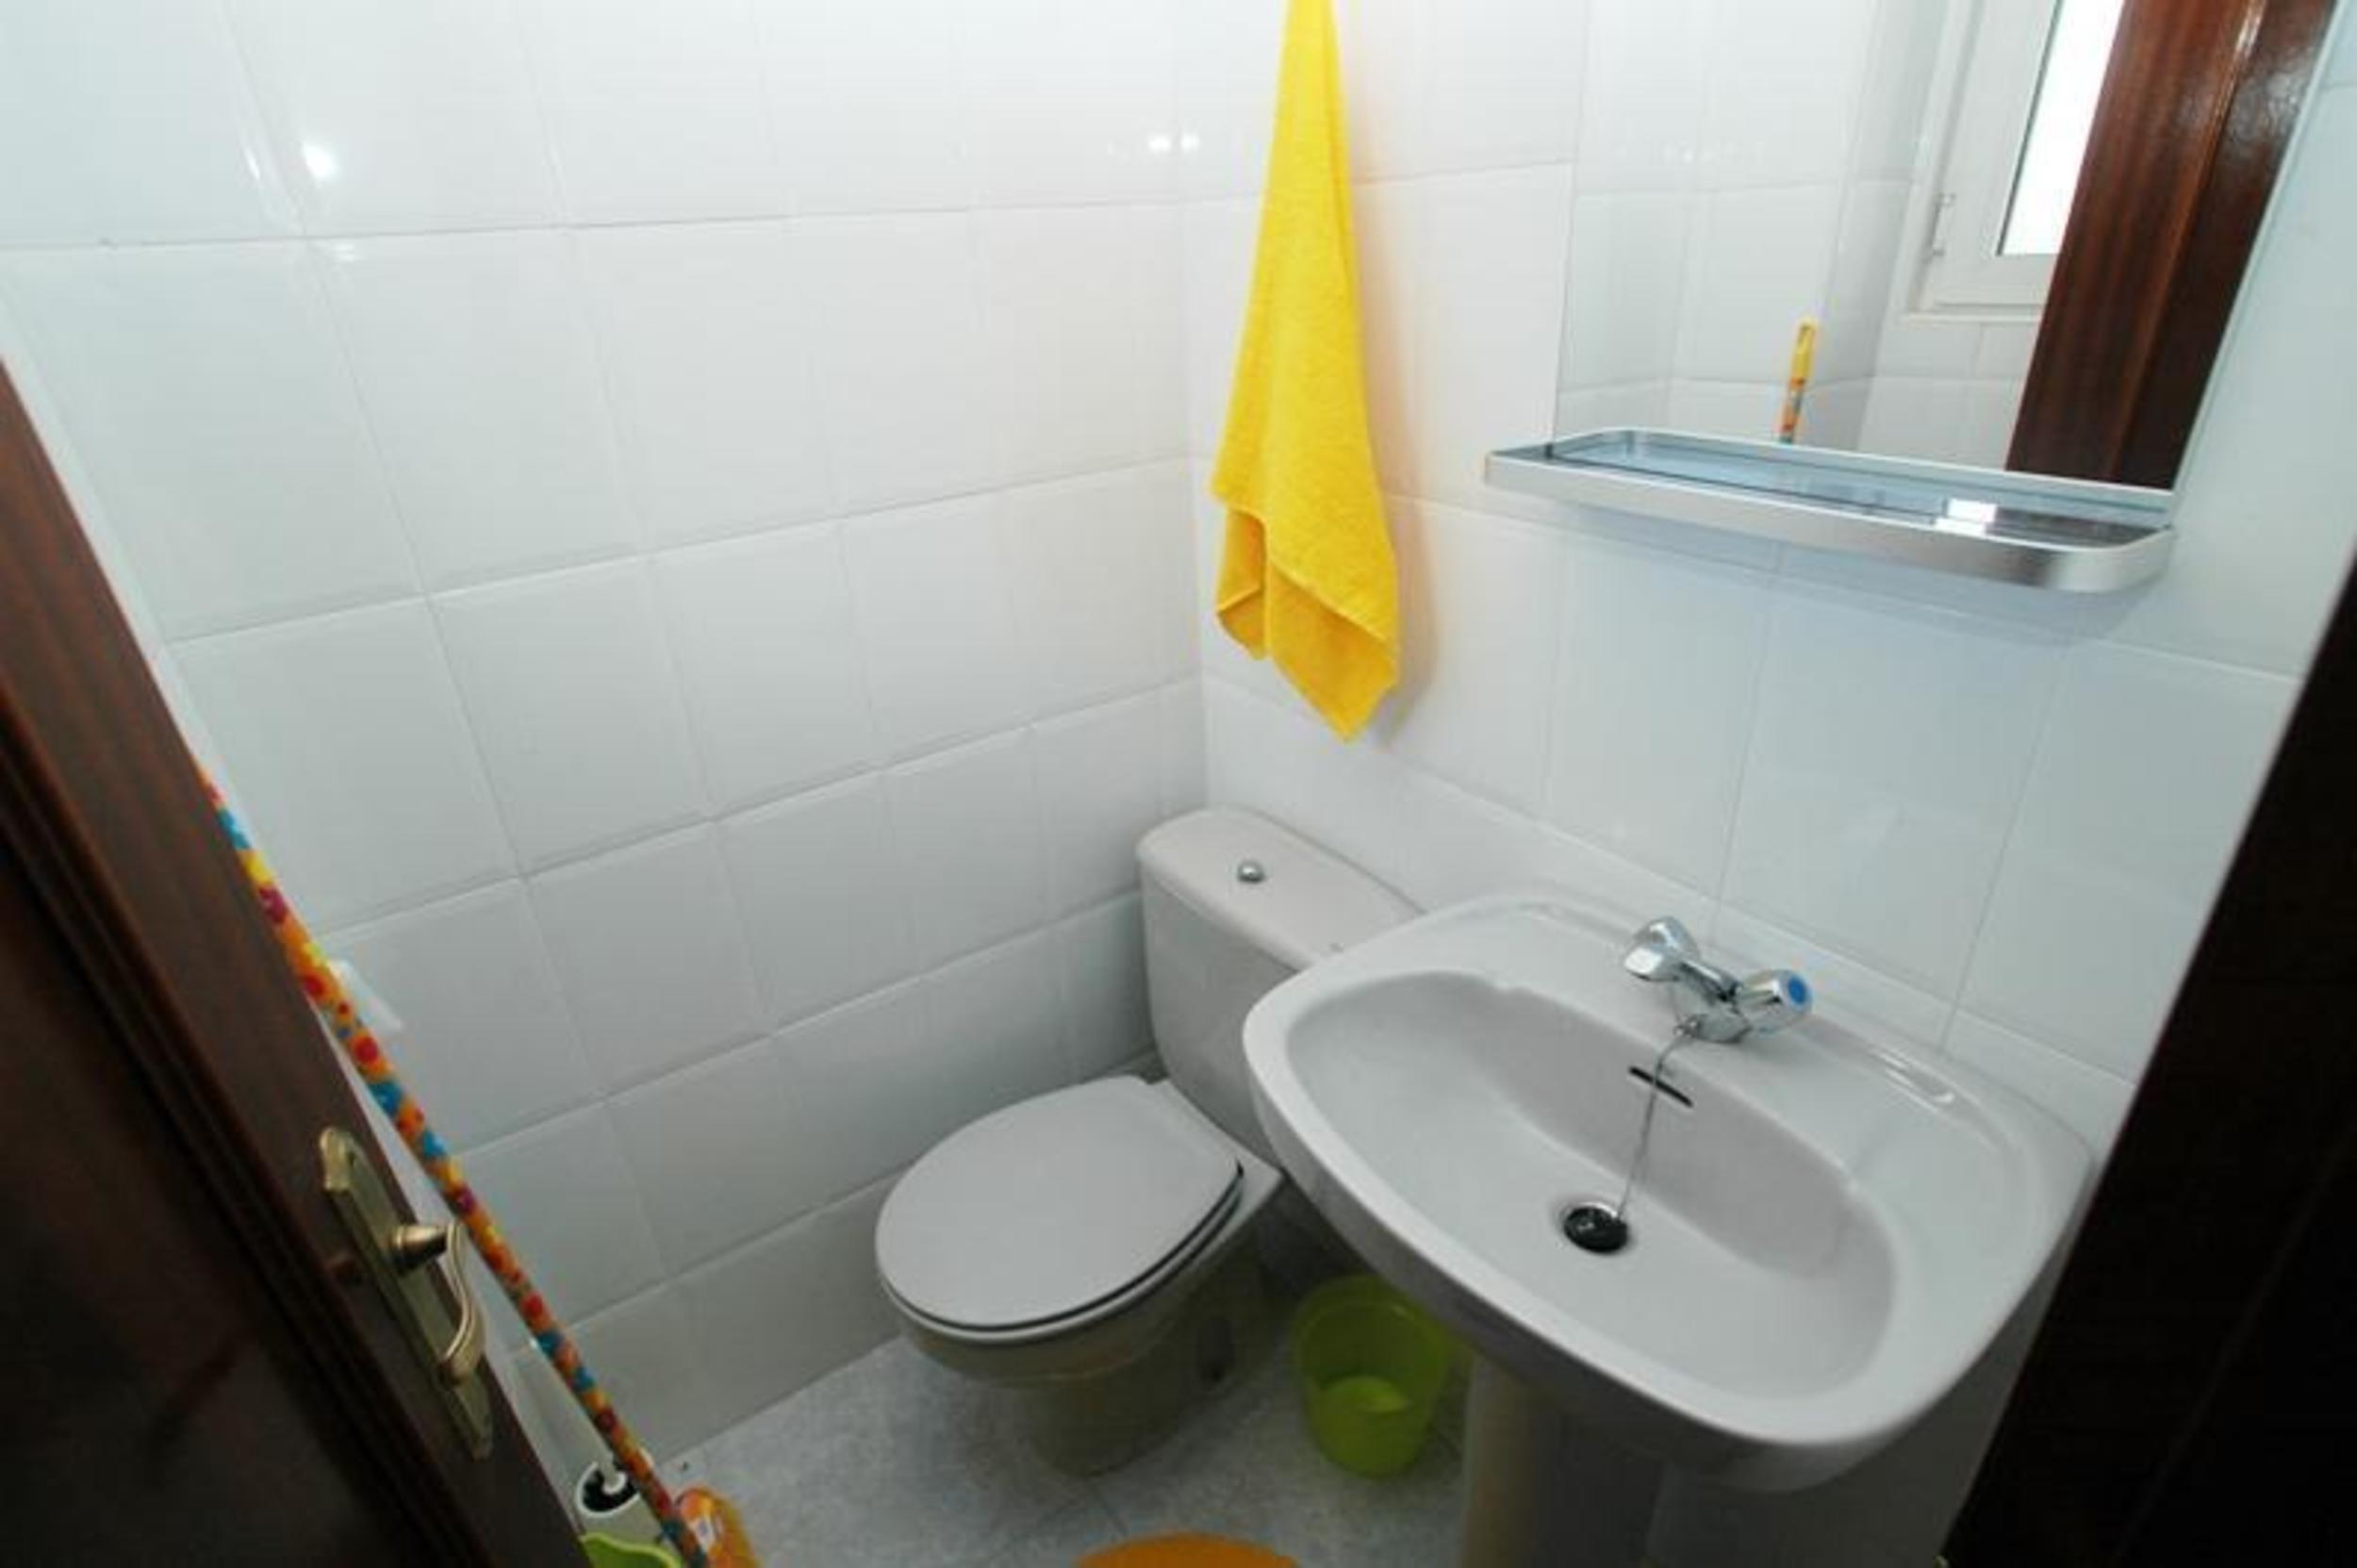 Ferienwohnung Apartment - 2 Bedrooms with Pool and Sea views - 102775 (2360880), Isla, Costa de Cantabria, Kantabrien, Spanien, Bild 4